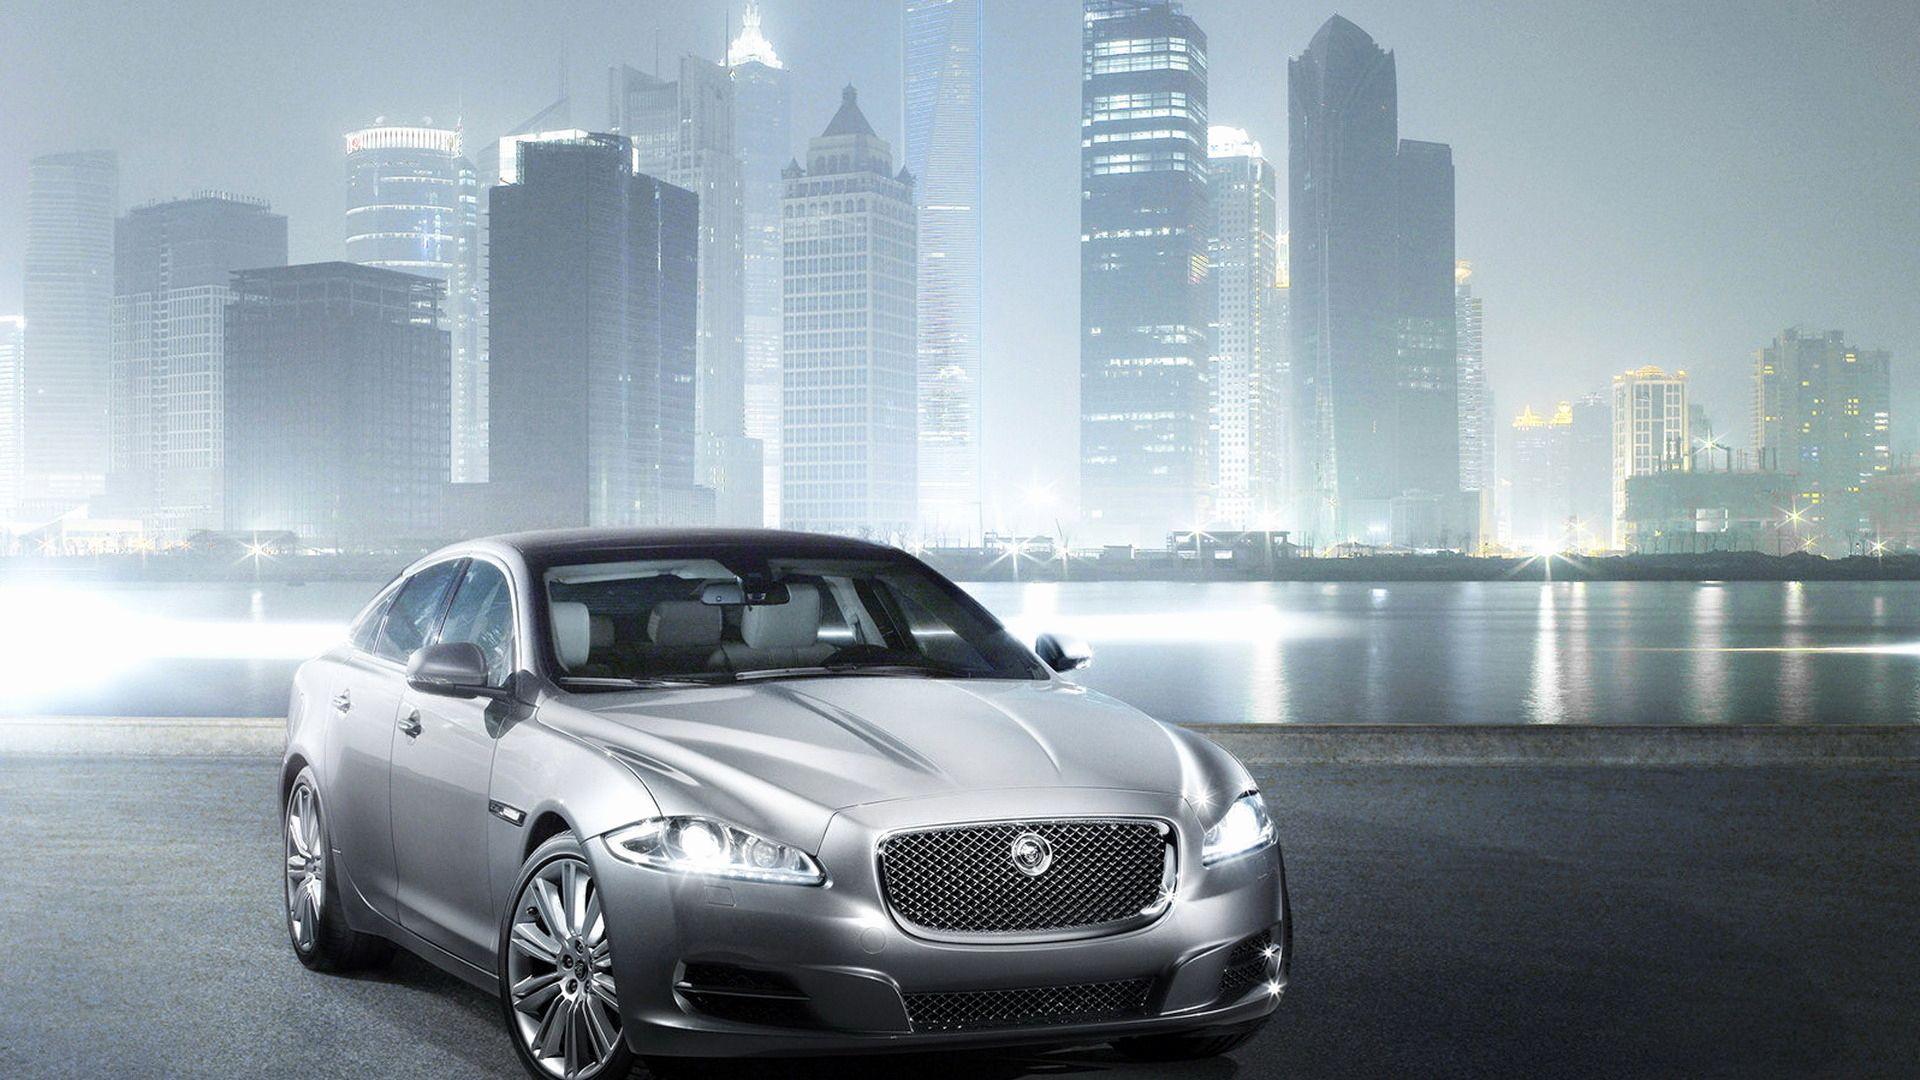 Jaguar Car Hd Wallpapers Top Free Jaguar Car Hd Backgrounds